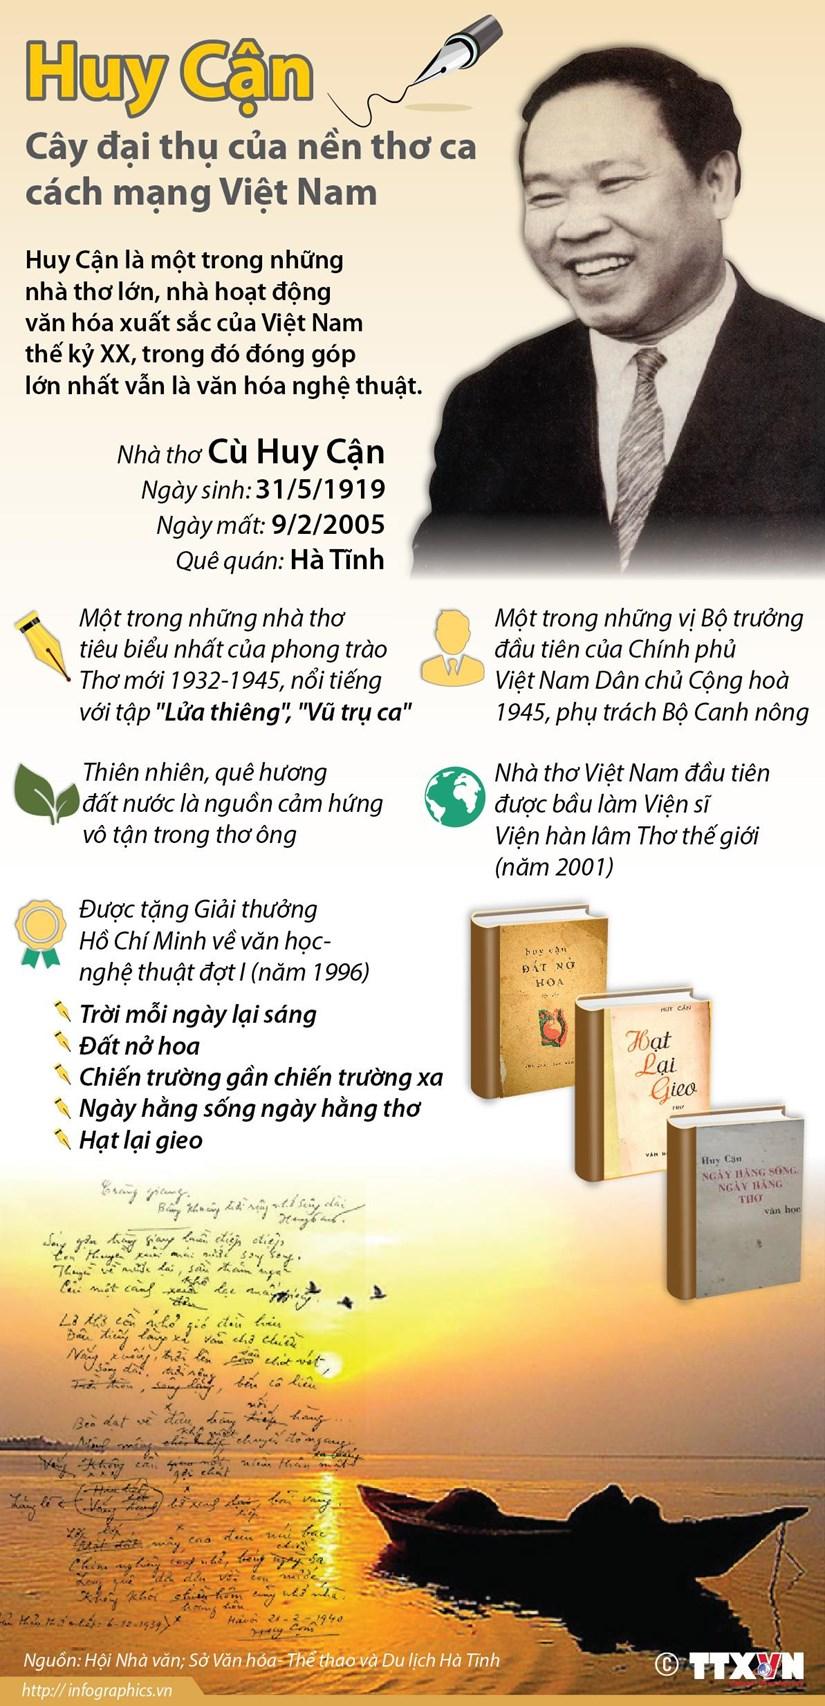 [Infographics] Huy Can - Cay dai thu cua nen tho ca cach mang hinh anh 1